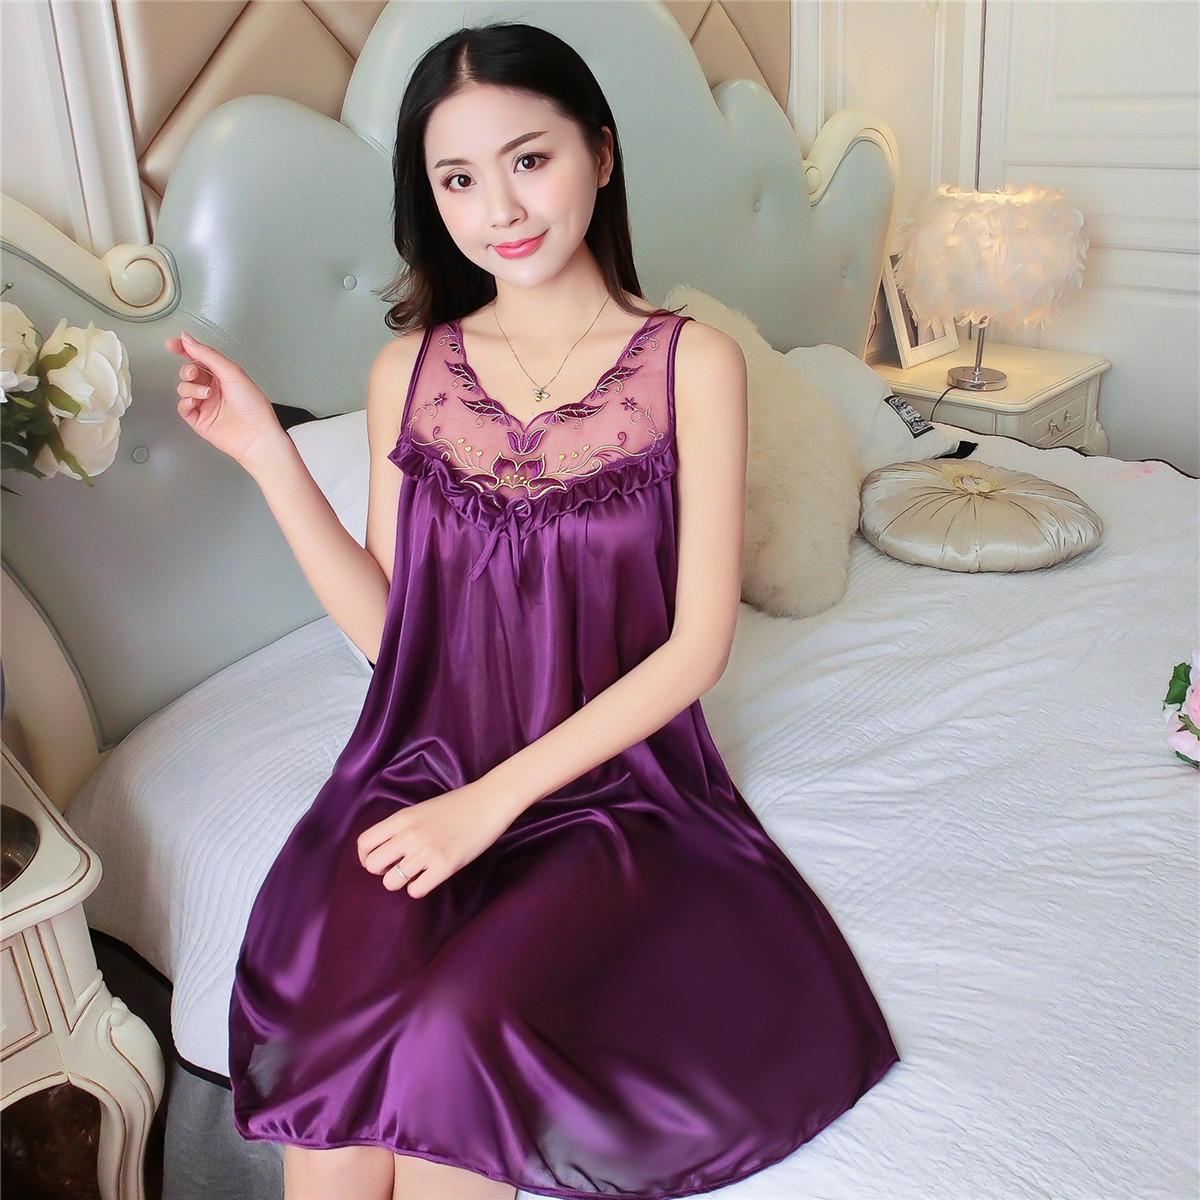 5323238cf6 Women Silk Nightgown 2018 New Sweet Young Sleeveless Fashion Girl Sleepwear  Summer Ladies Sleepshirts 7 colour-in Nightgowns   Sleepshirts from  Underwear ...